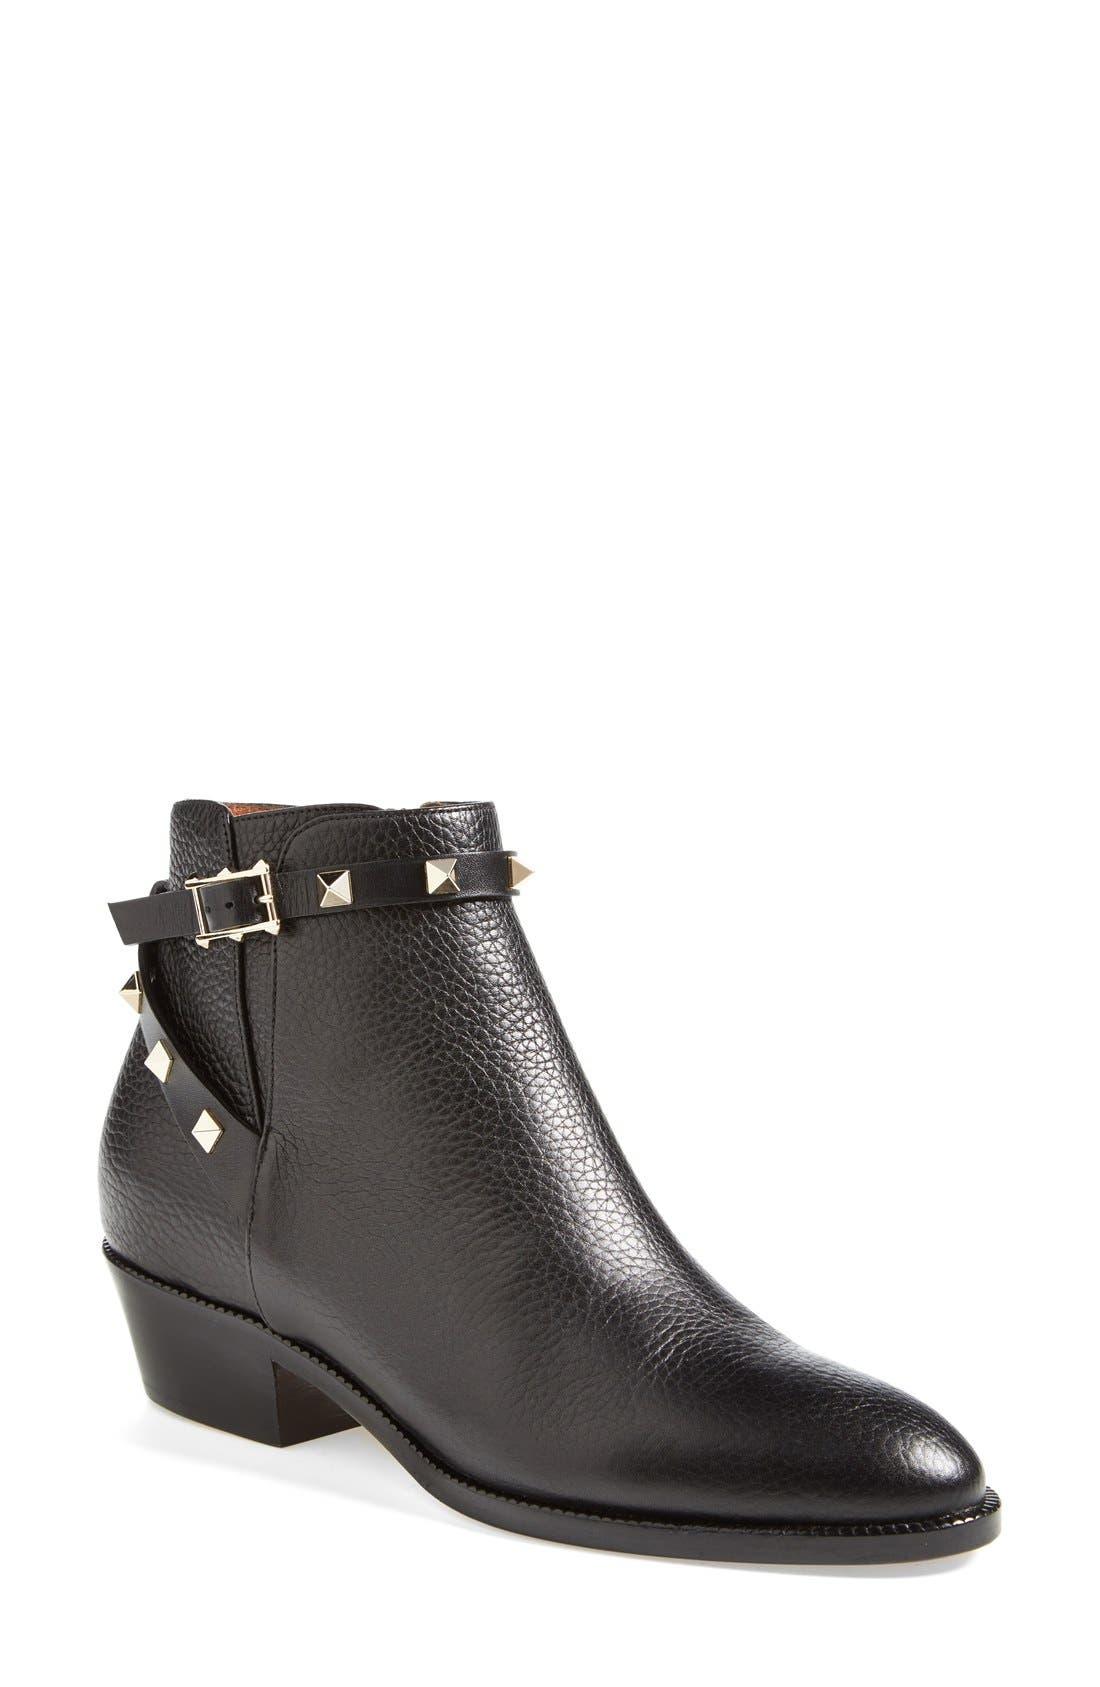 Alternate Image 1 Selected - VALENTINO GARAVANI 'Rockstud' Ankle Boot (Women)